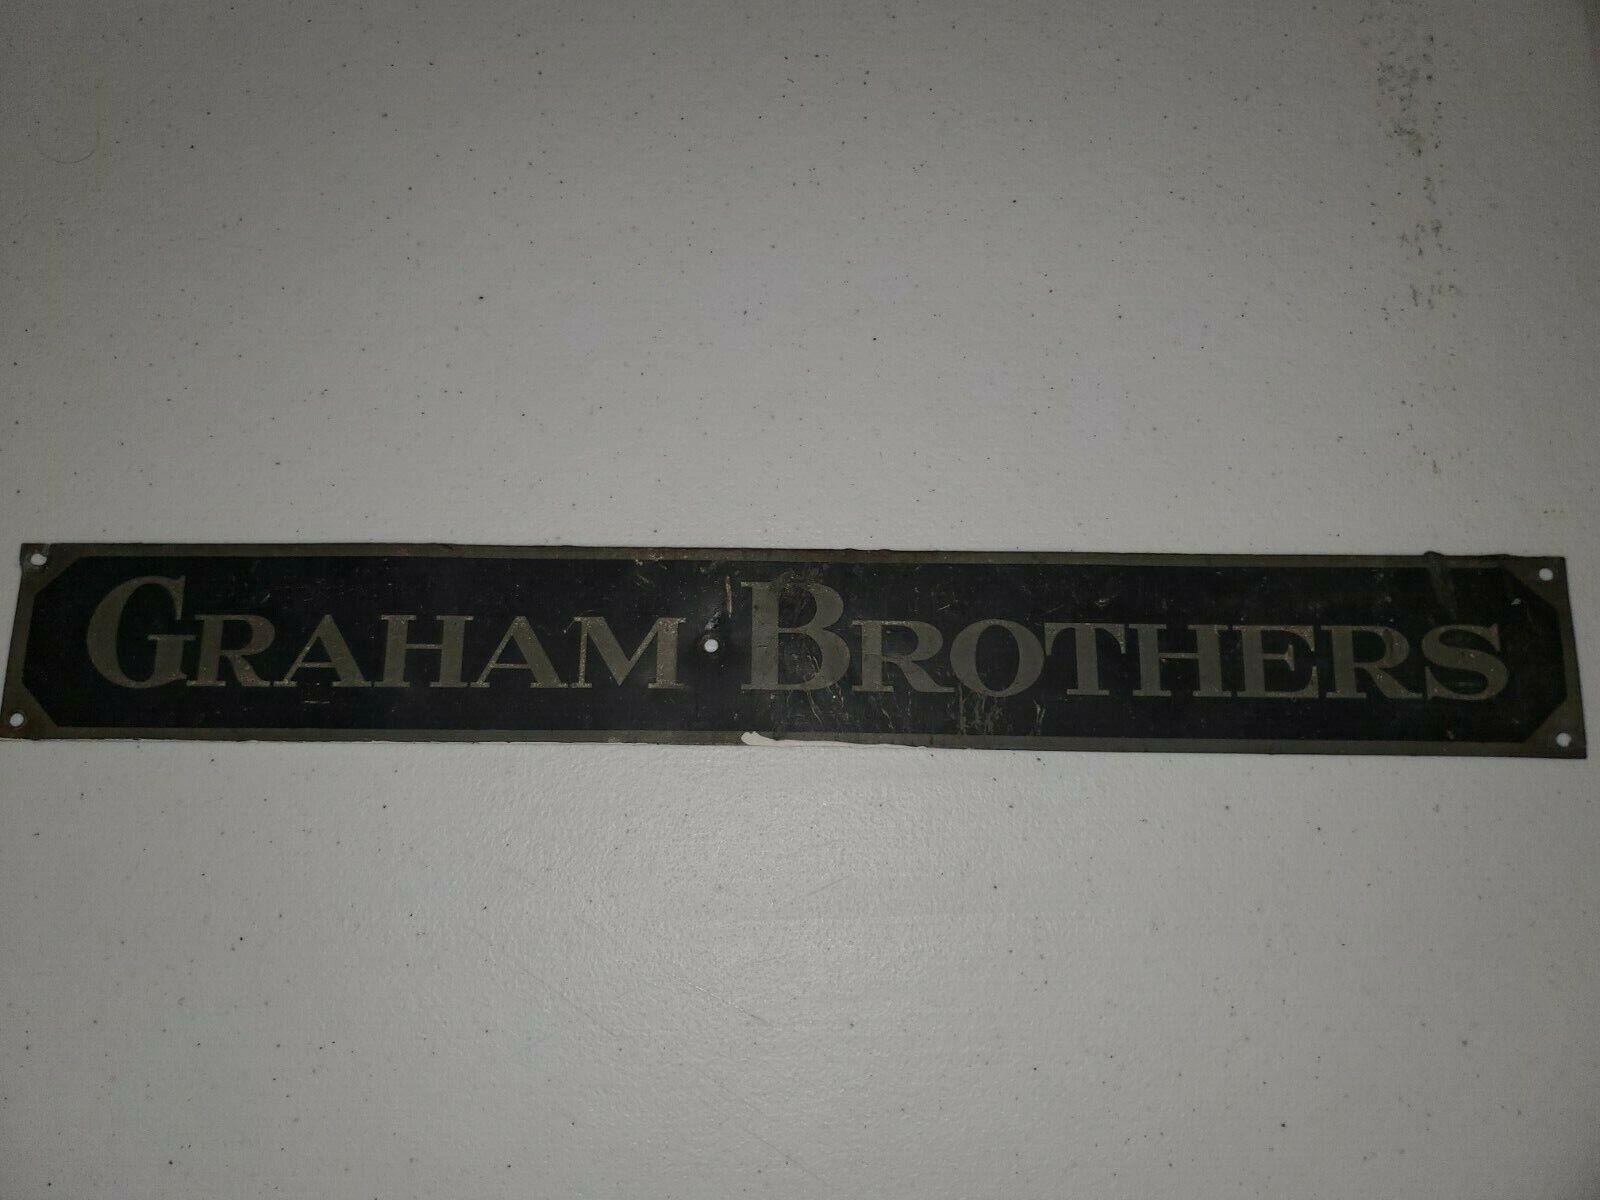 Image 1 - Graham-Brothers-Truck-Frame-Name-Plate-1920s-ORIGINAL